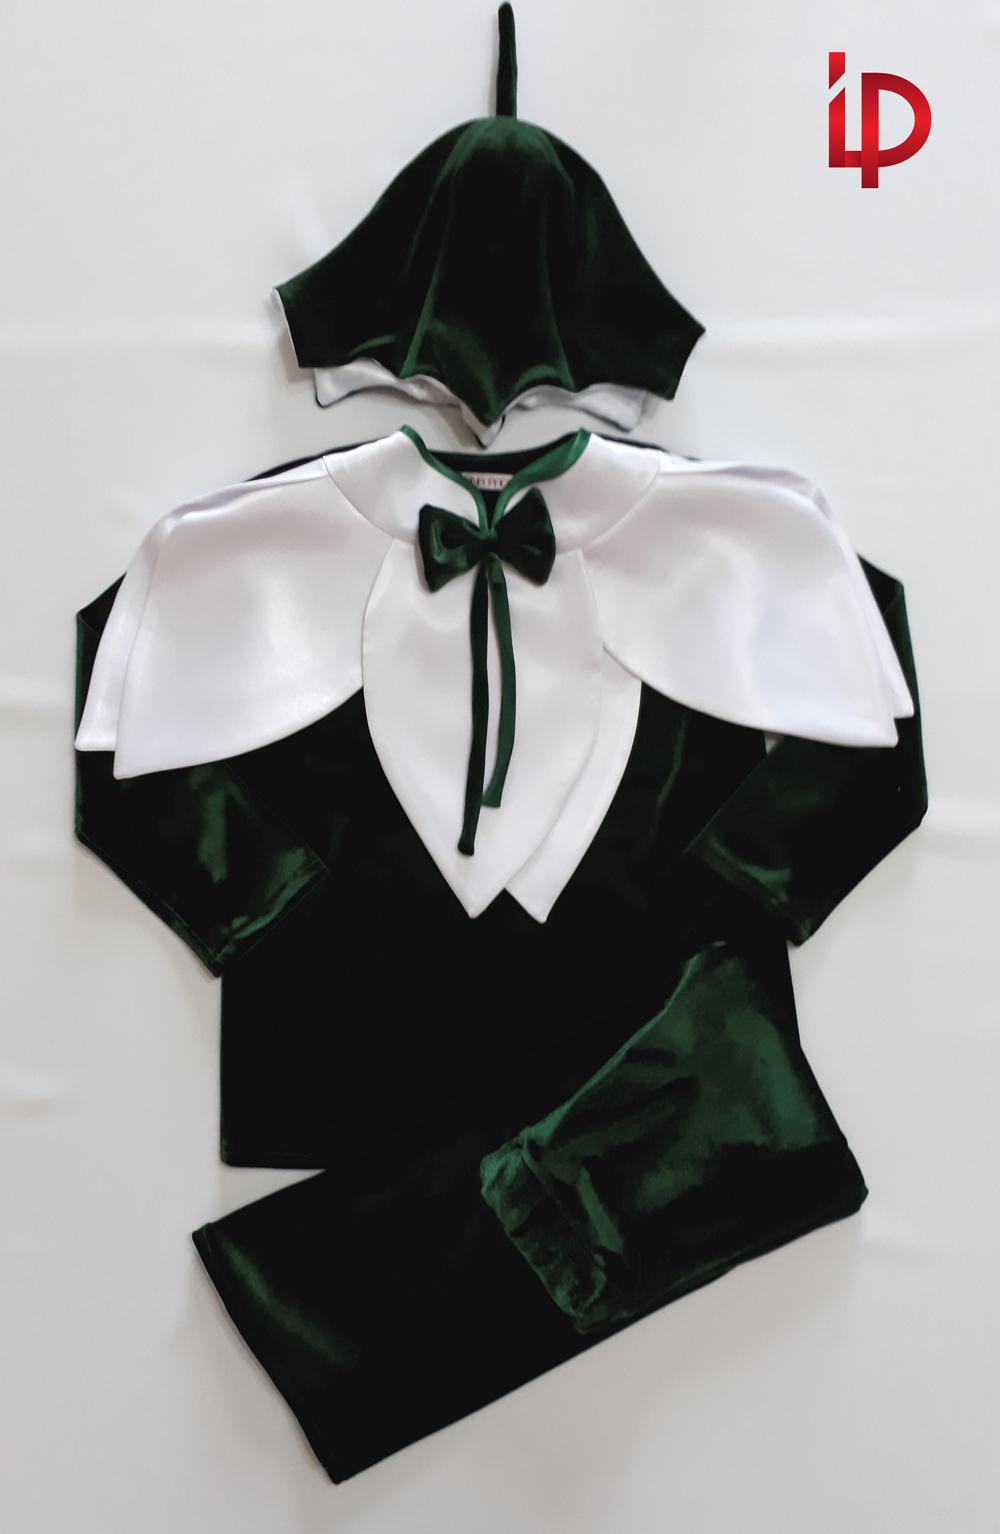 Costum de Ghiocel. Virsta 2-7 ani. Diferite marimi. Realizare la comanda / Chirie.